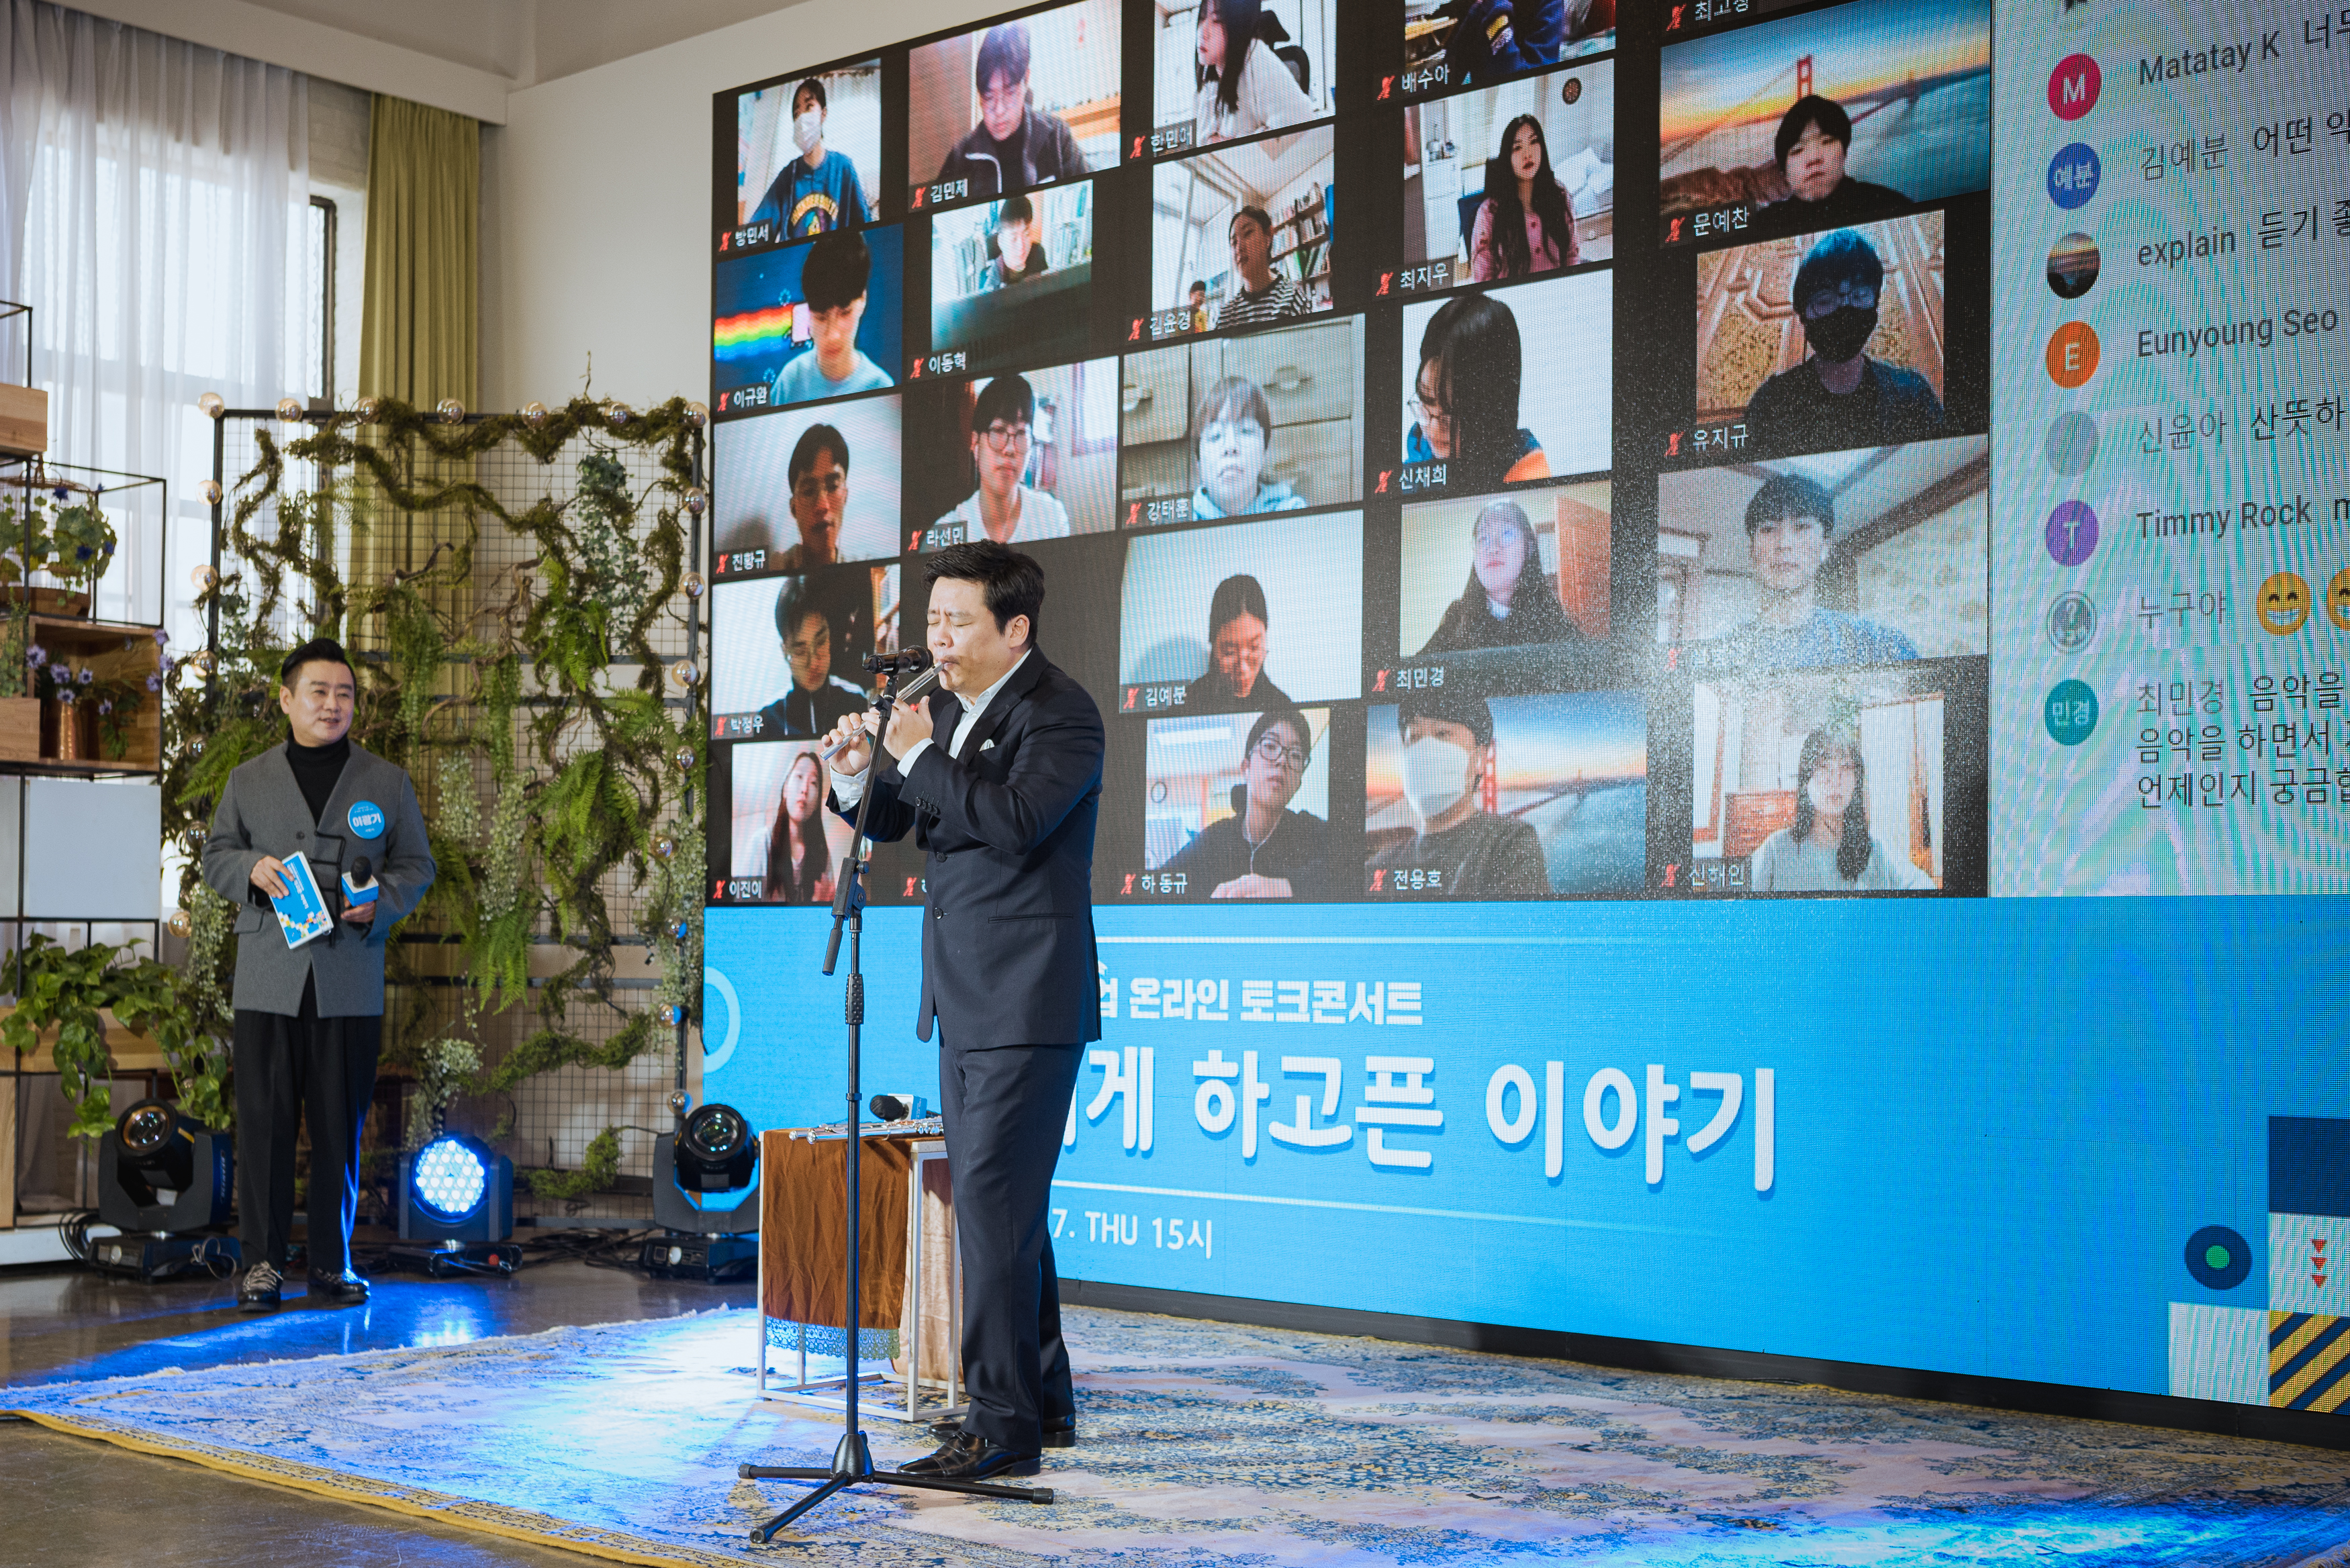 KDB장학사업 온라인 토크콘서트-너에게 하고픈 이야기_송솔나무 (45).jpg